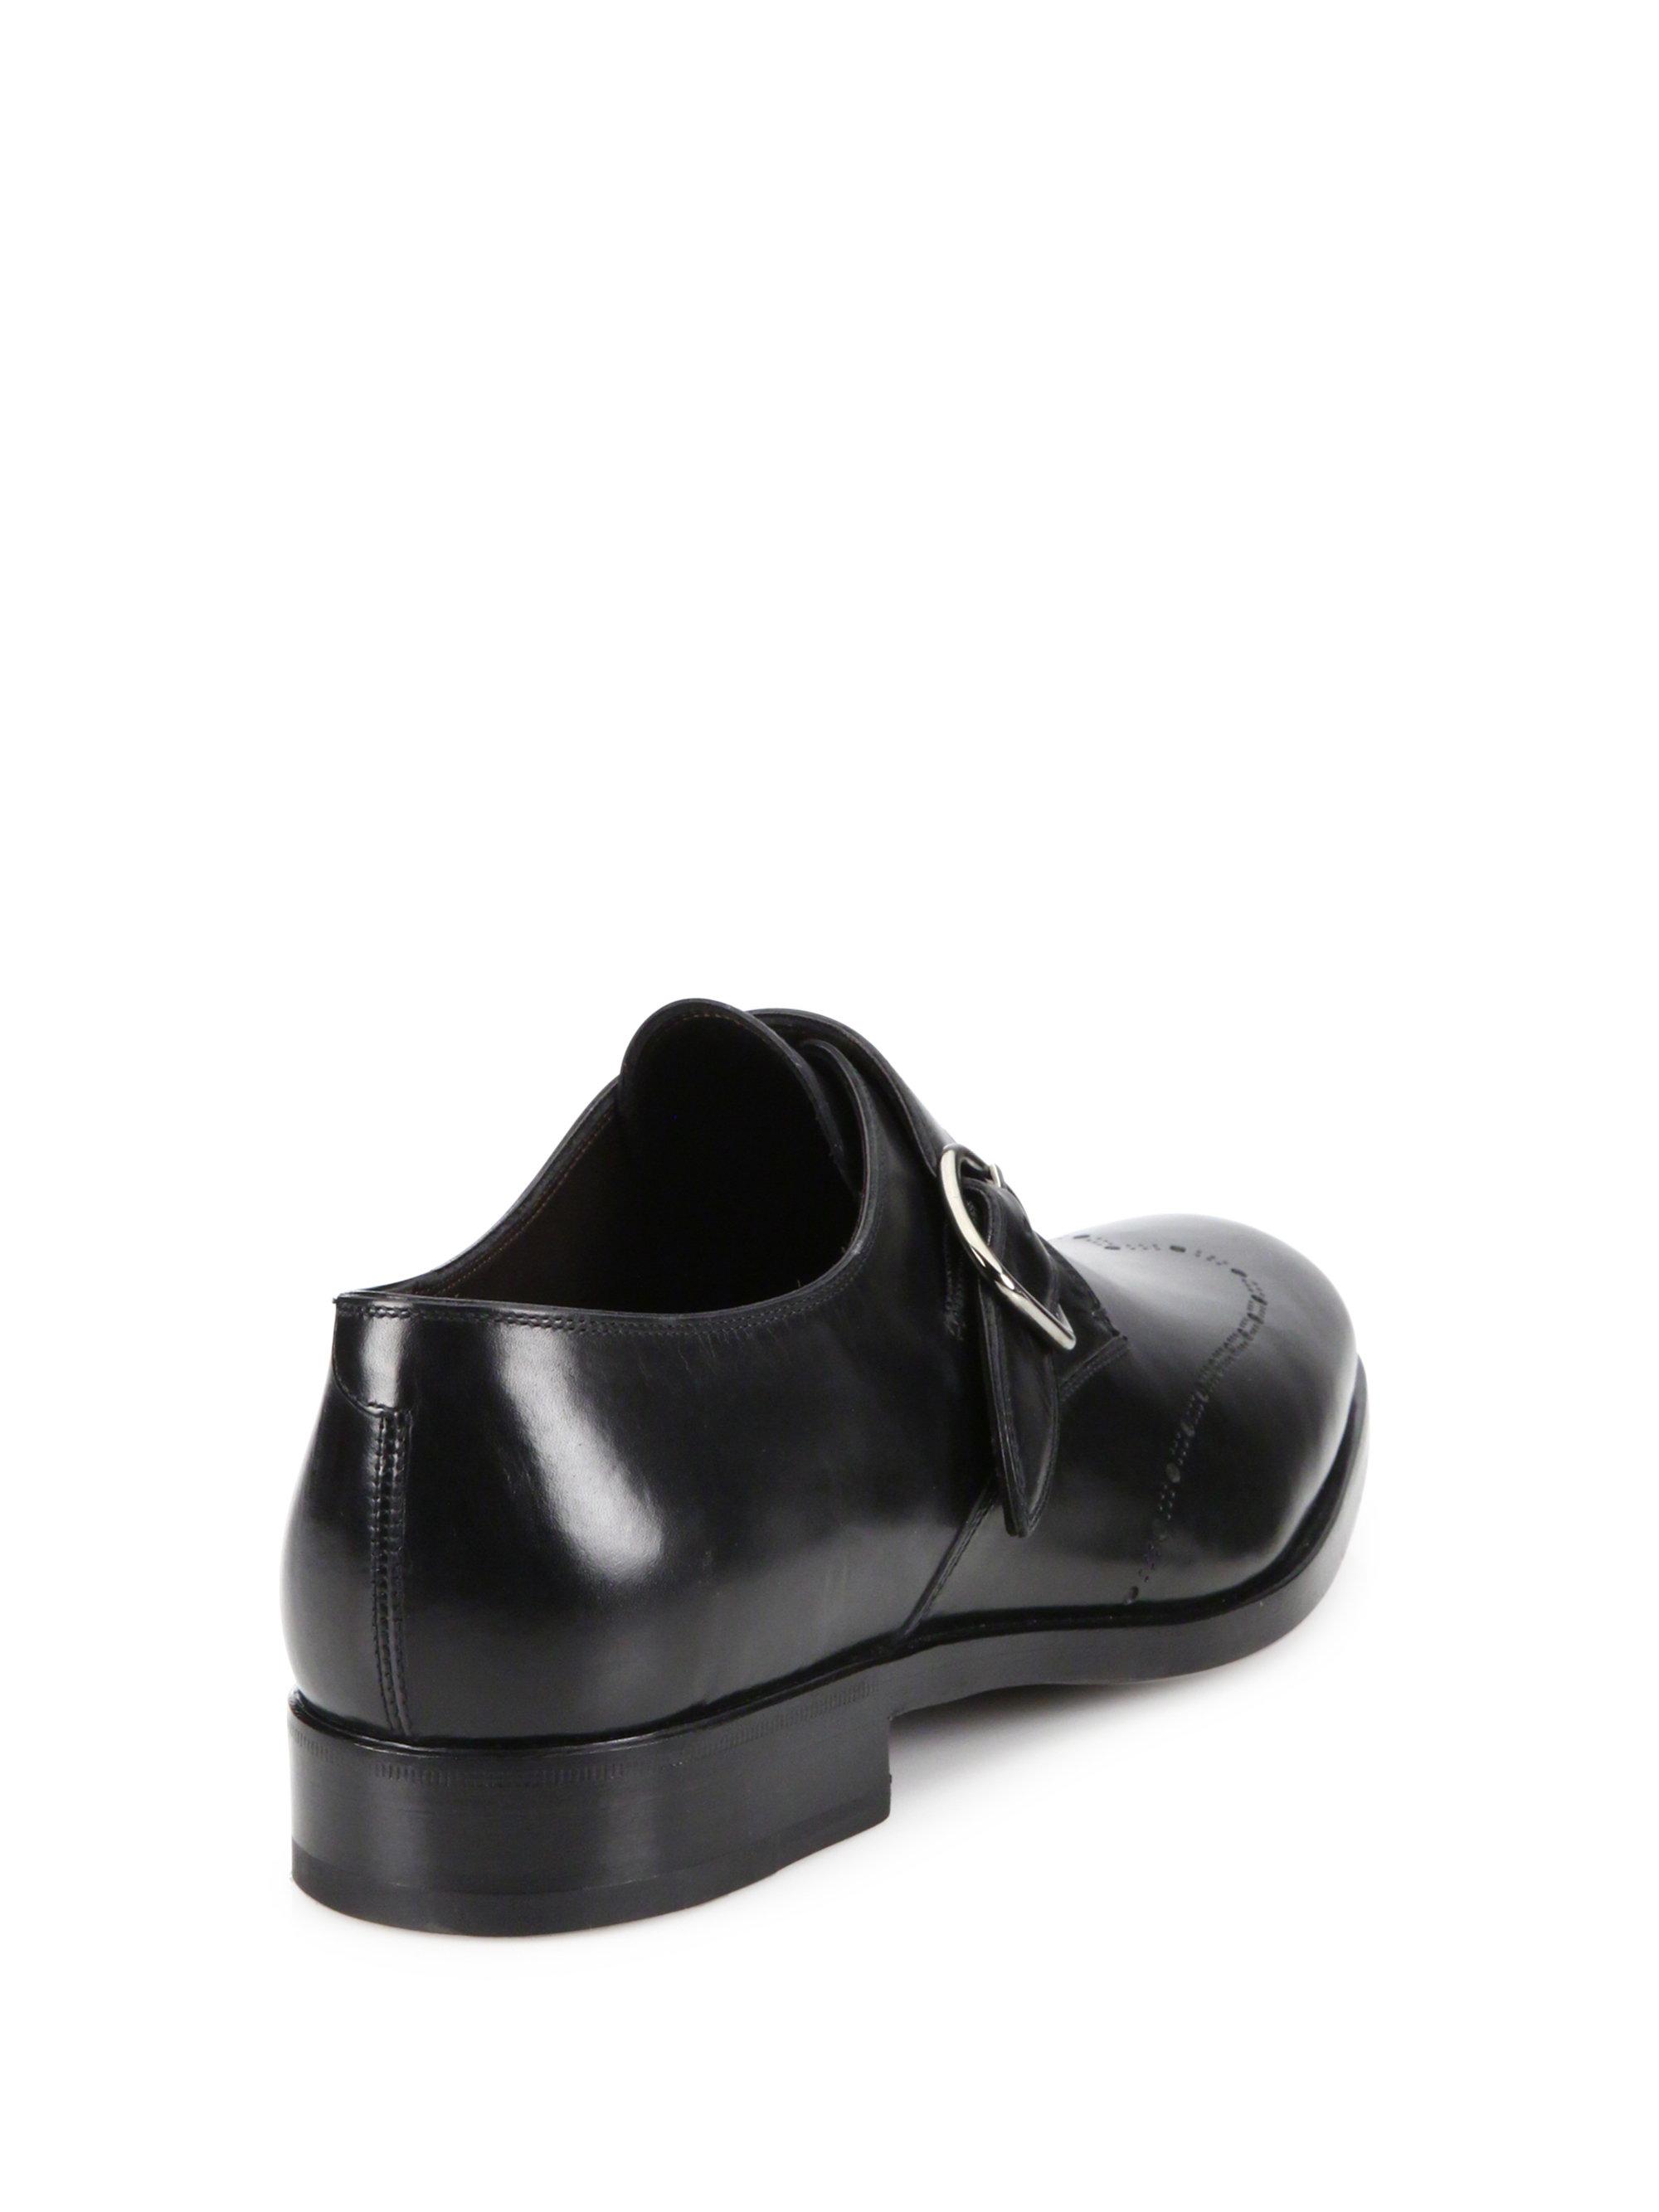 novara single men ★ bugatchi novara wingtip (men) @ today price mens dress shoes, shop new arrivals & must-have styles [bugatchi novara wingtip (men)] shop with guaranteed low prices.